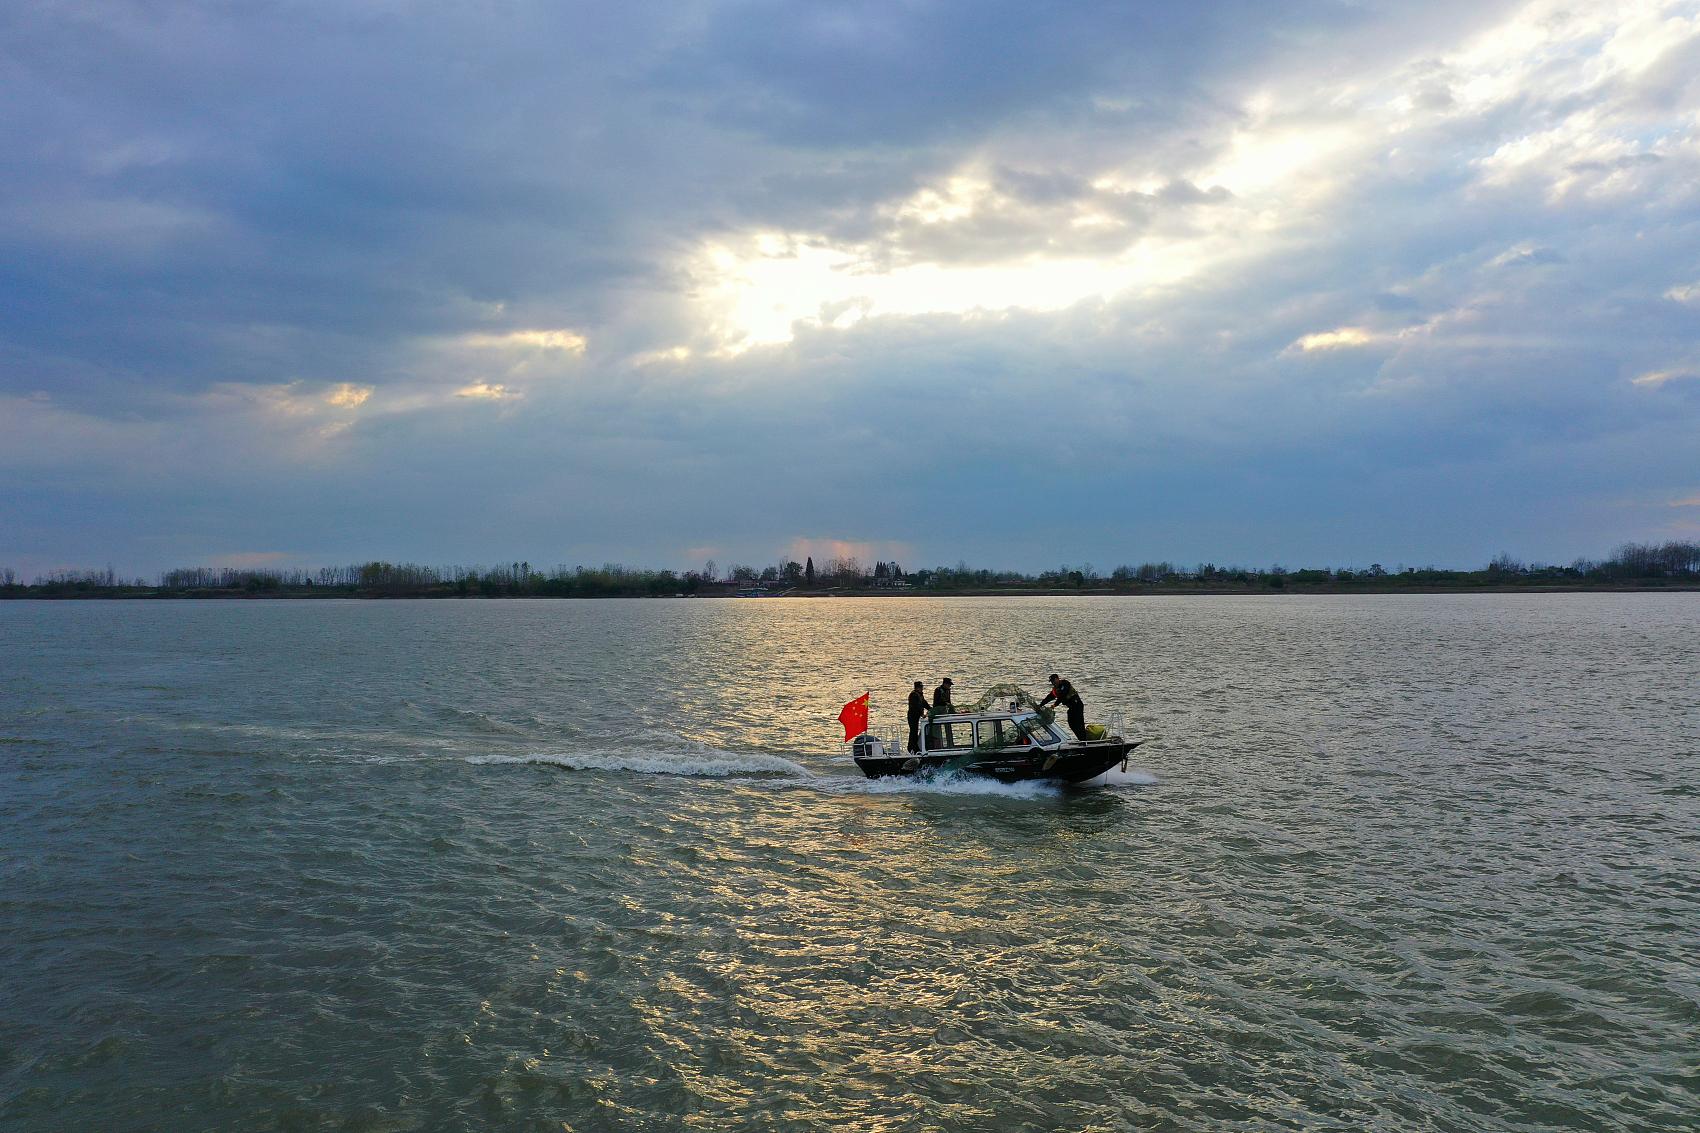 Yangtze River fishing ban sees notable progress